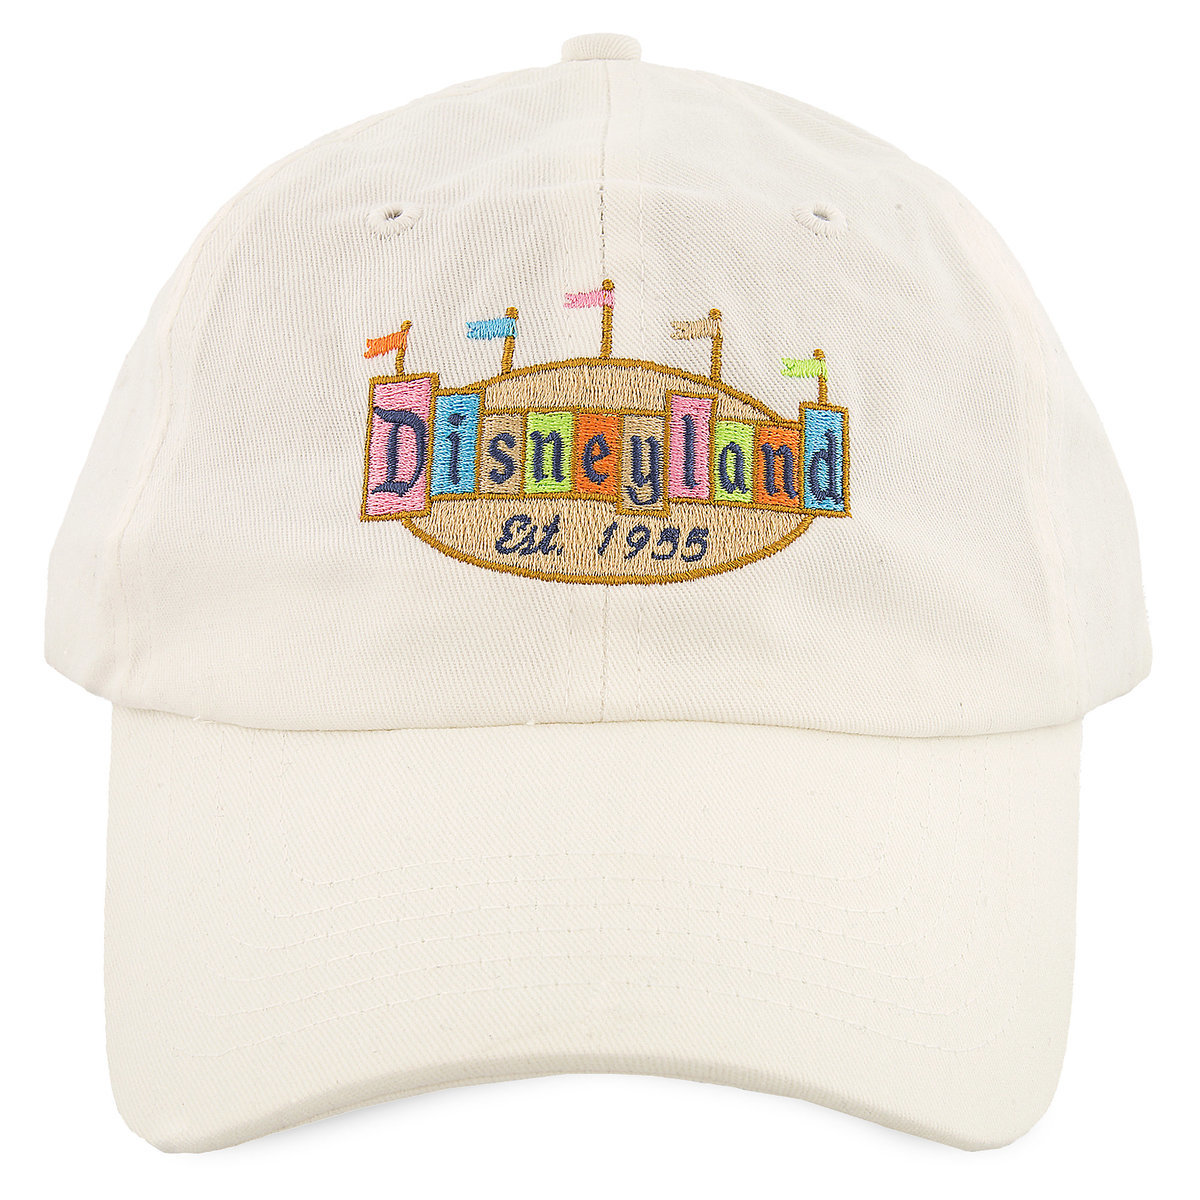 Add to My Lists. Disney Baseball Cap - Disneyland ... e5a3d127f27